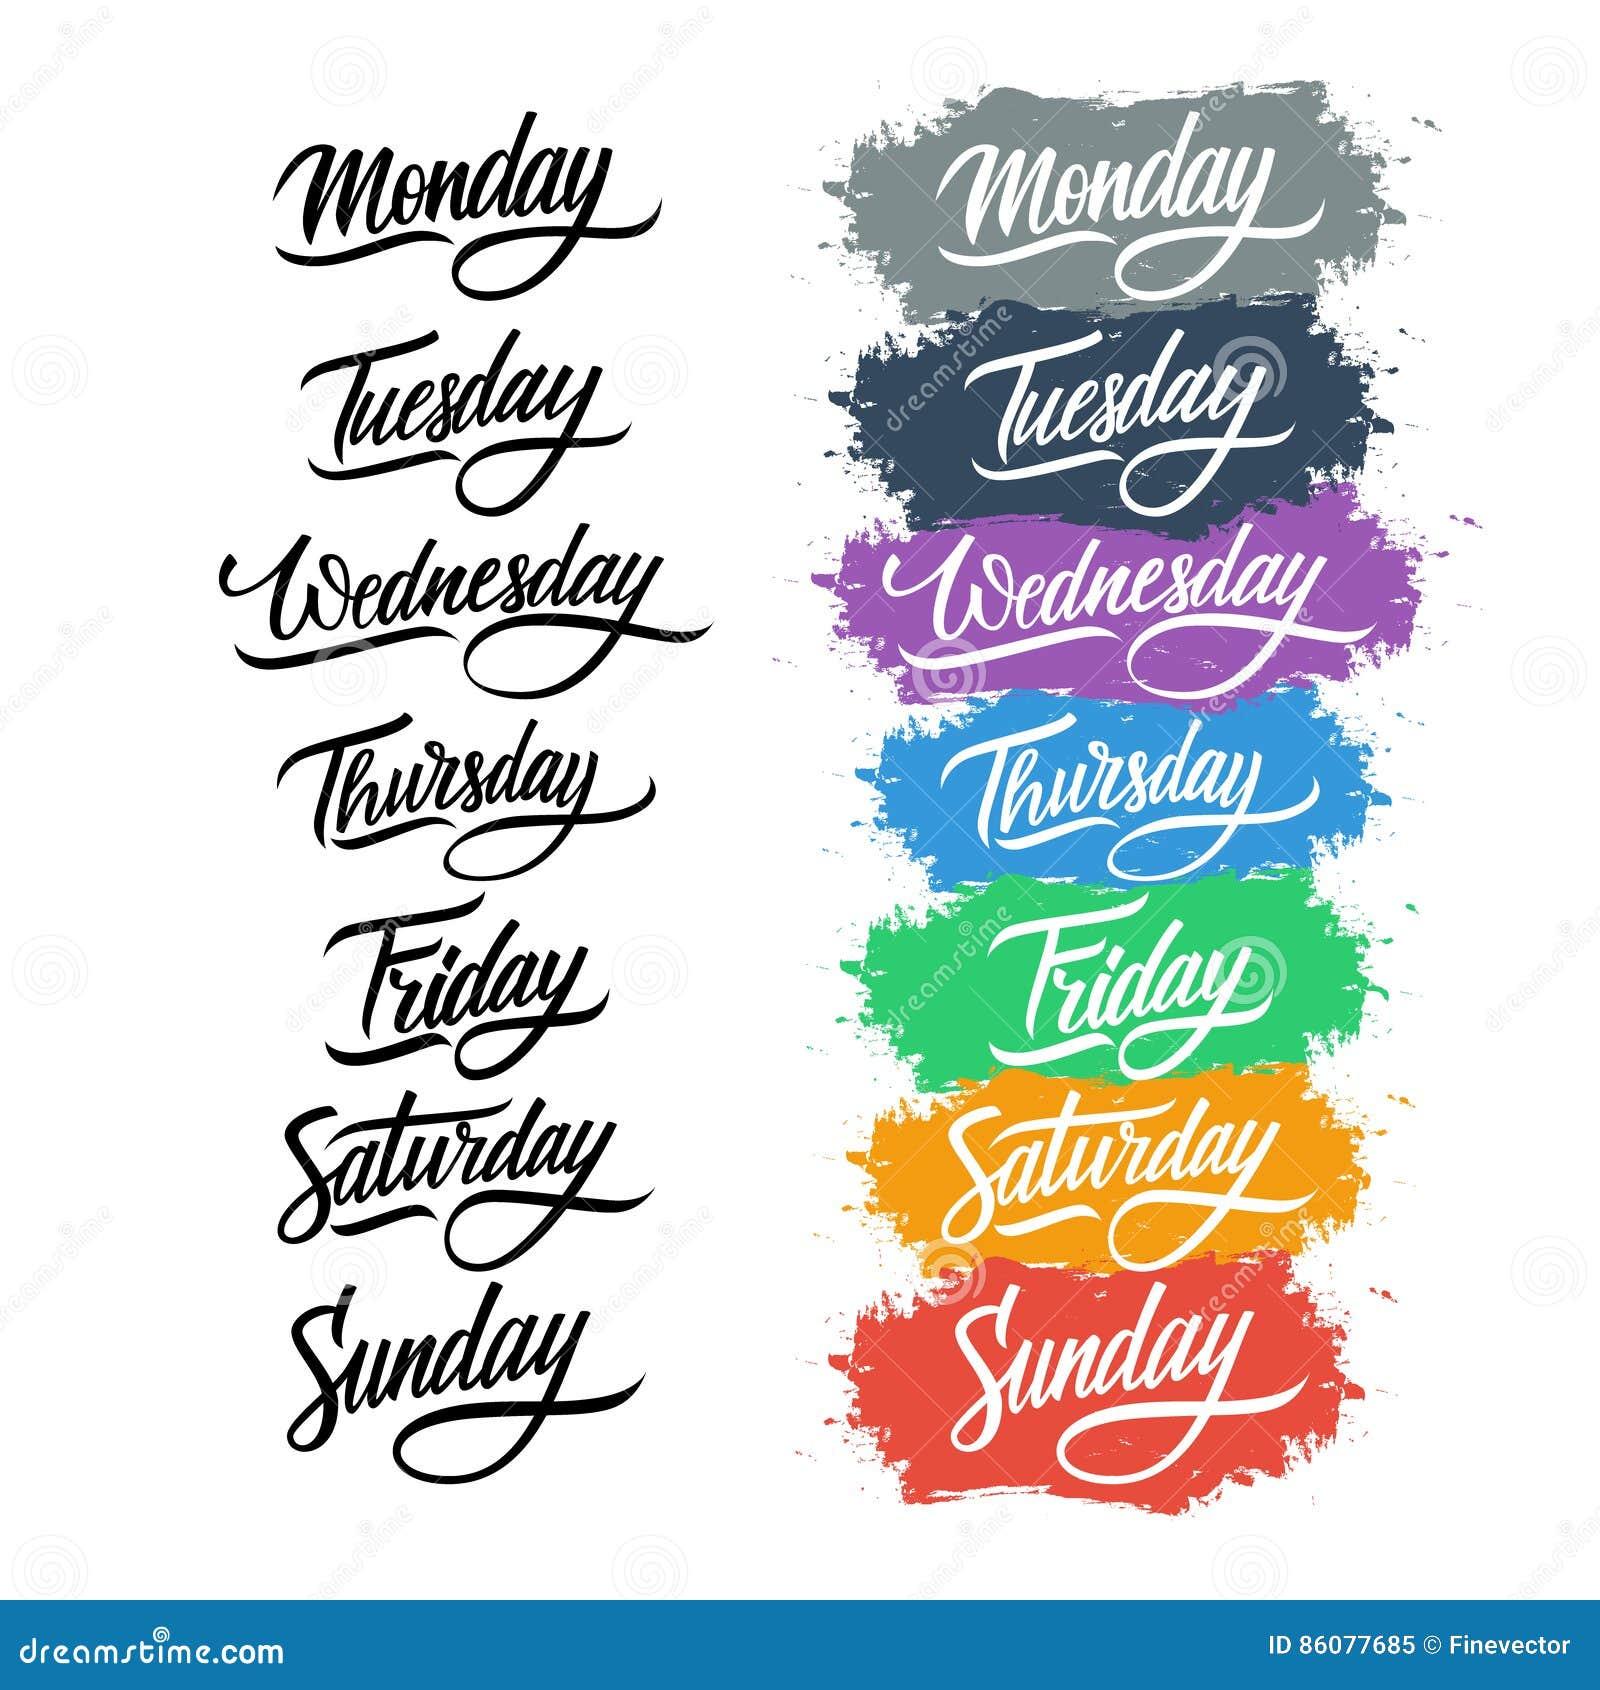 Handwritten week days calligraphy royalty free stock